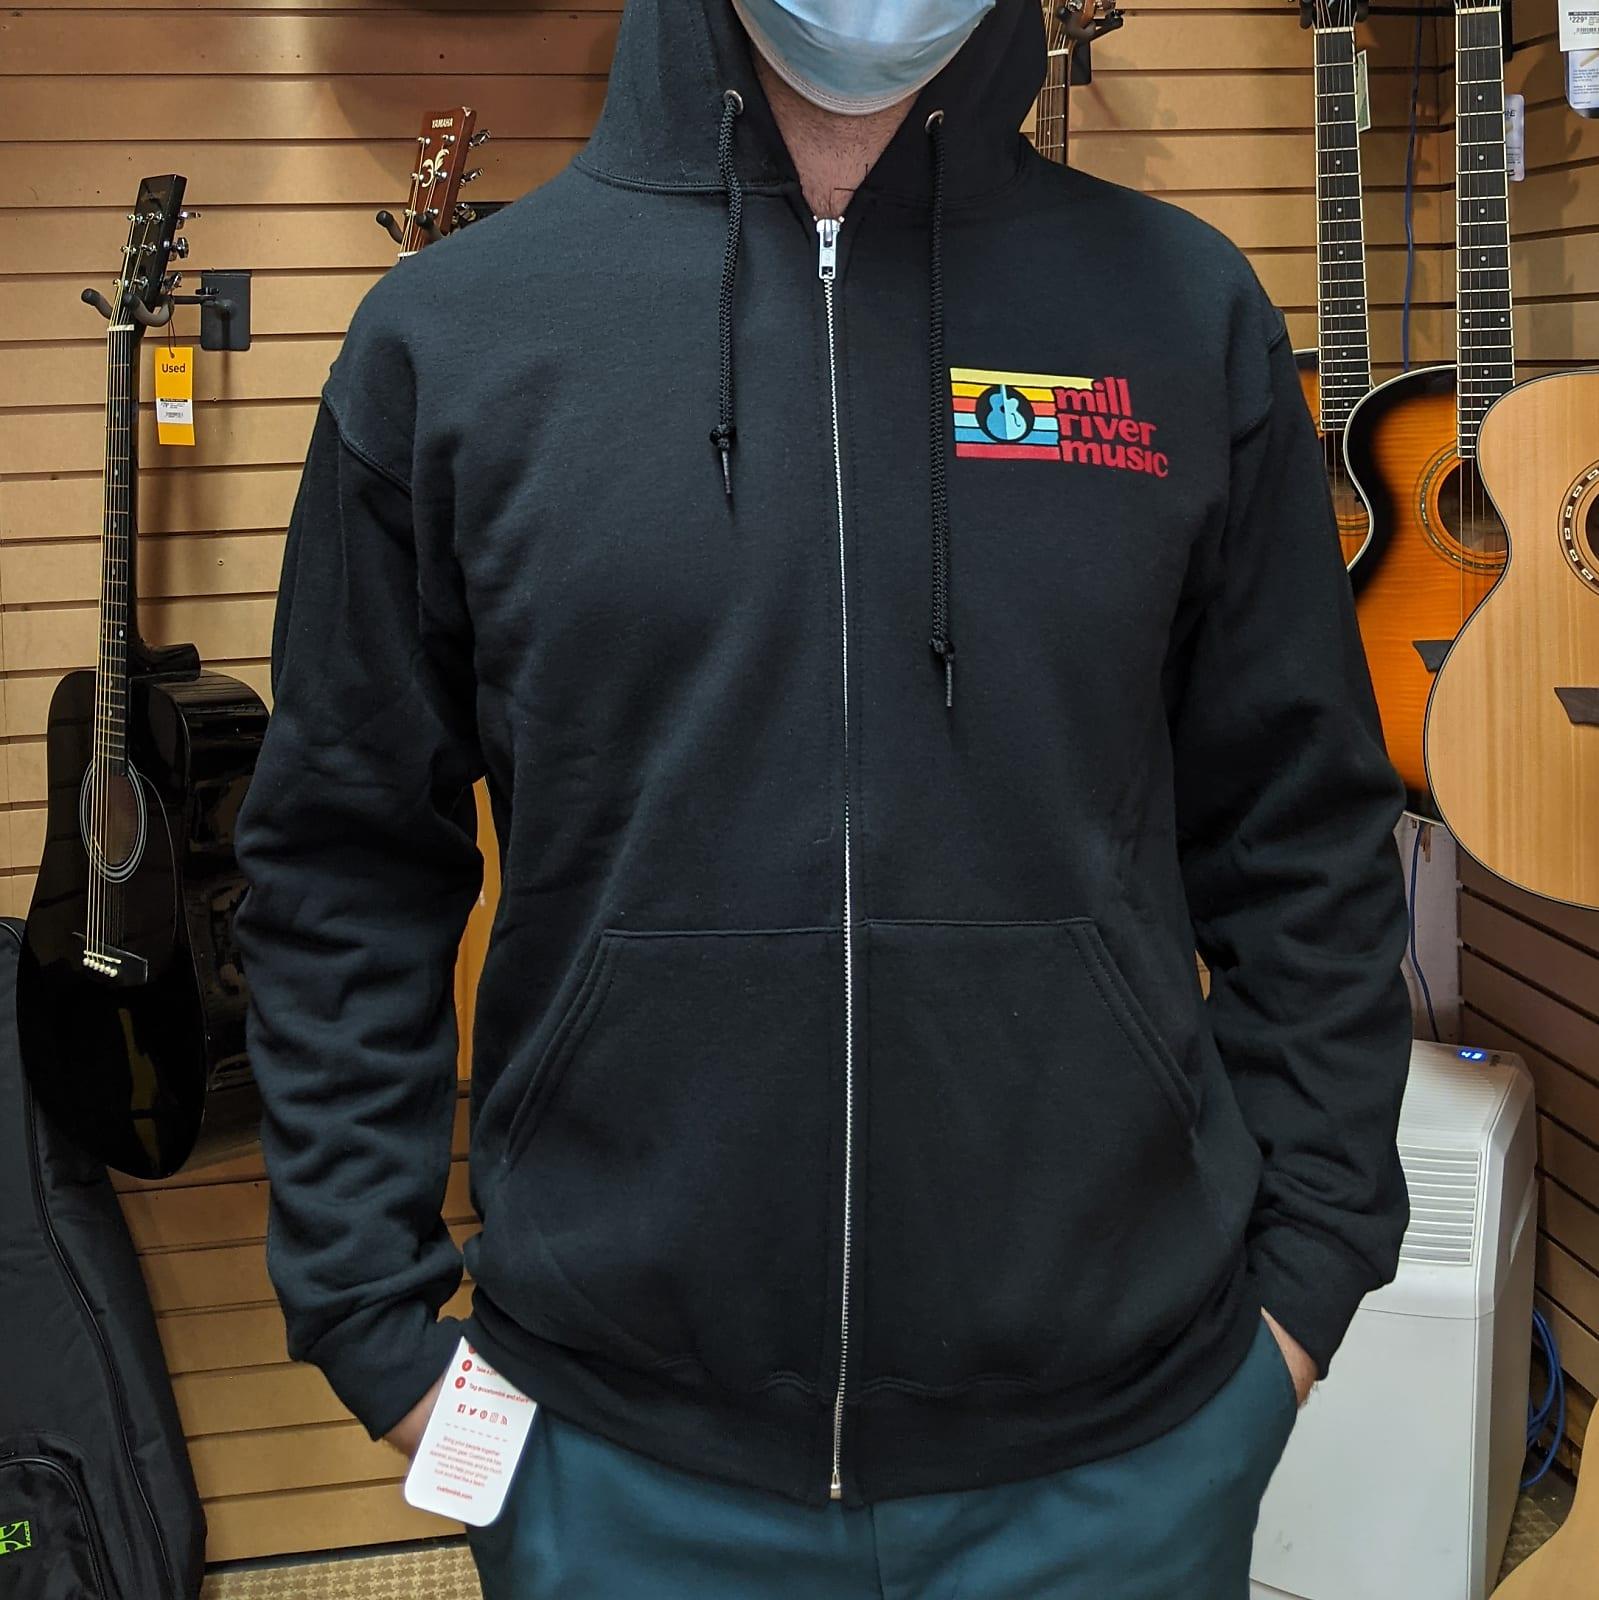 Mill River Music Zip Hoodie 1st Edition Main Logo Unisex Black Medium